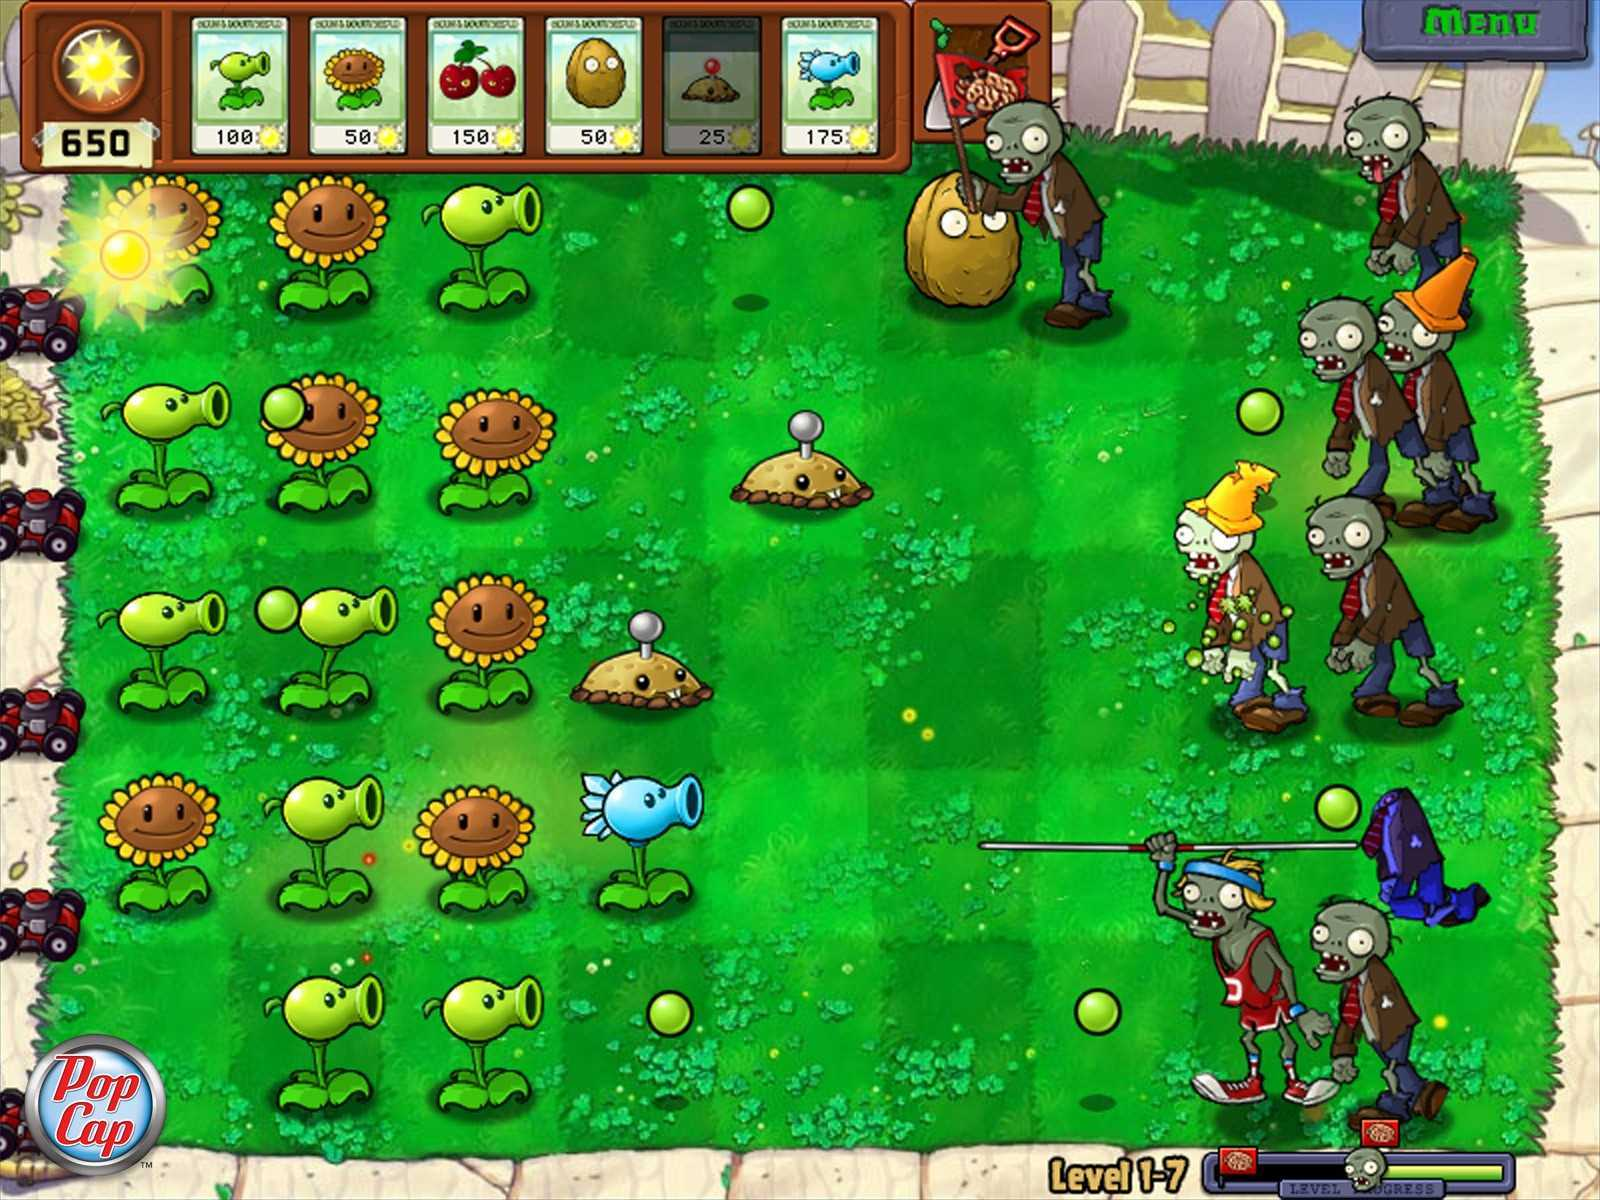 Растения против зомби / Plants vs. Zombies v1.7.0.0 (2010/PC/RUS